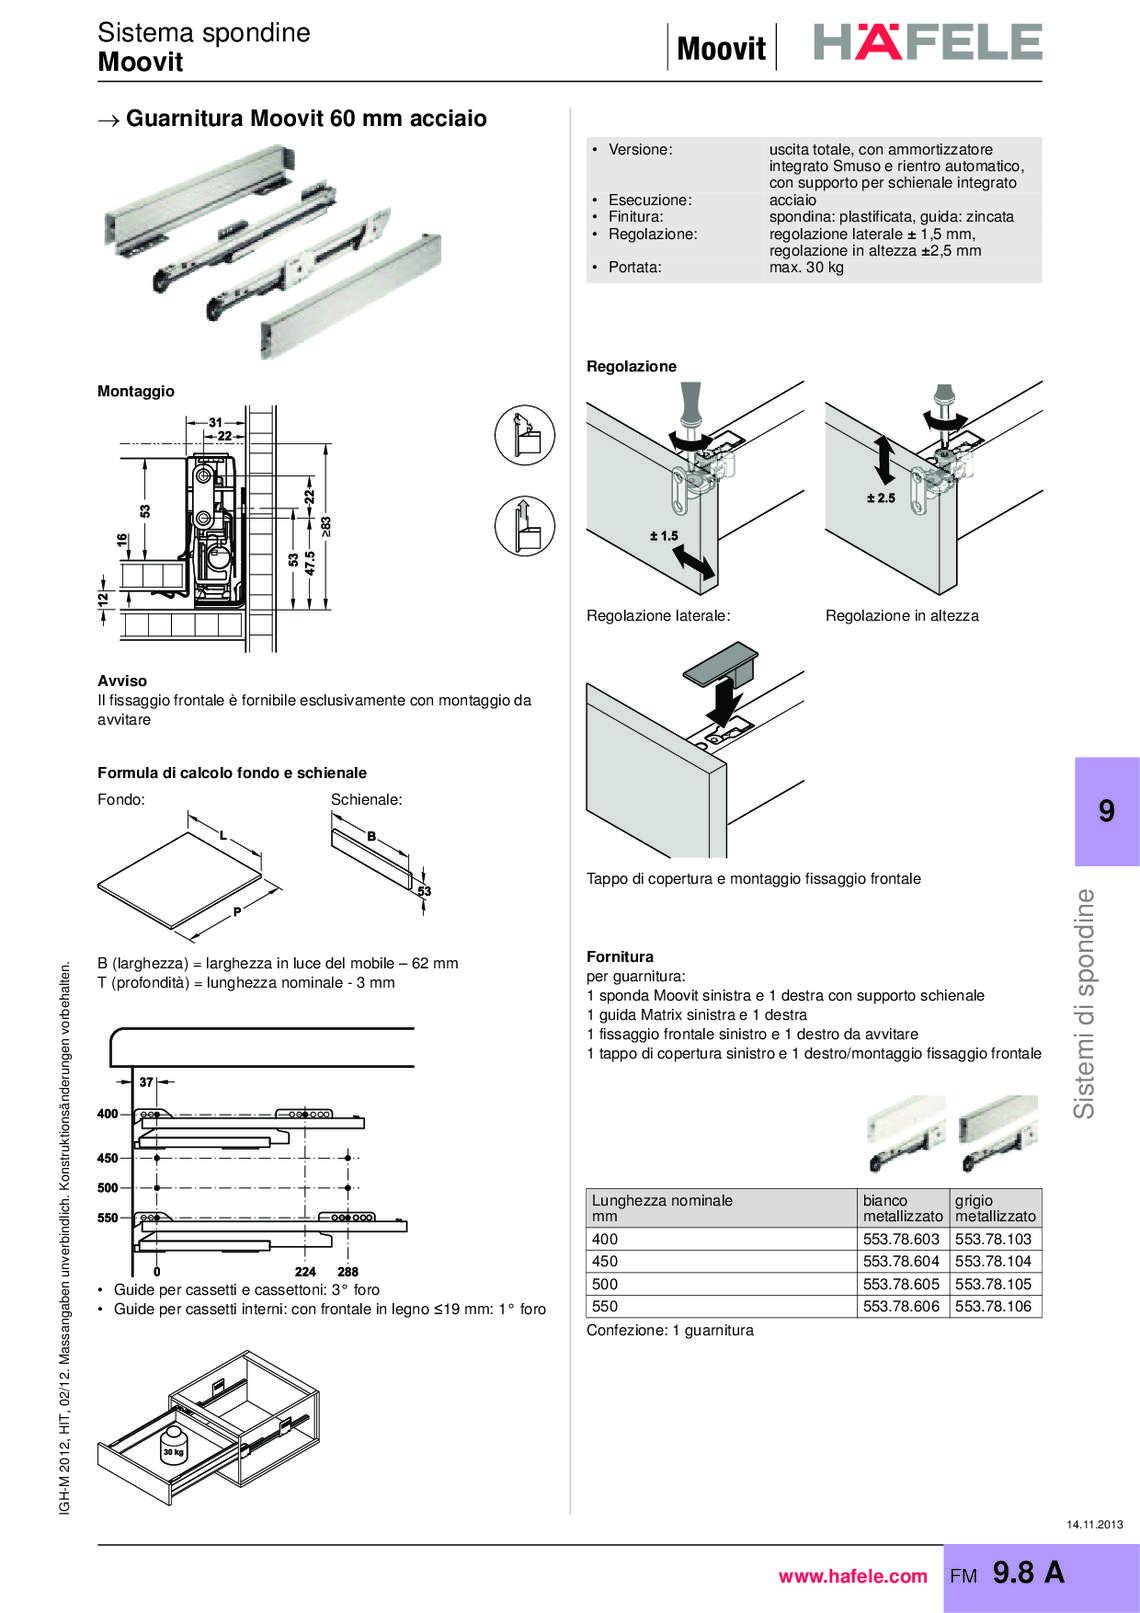 hafele-spondine-e-guide-per-mobili_40_018.jpg